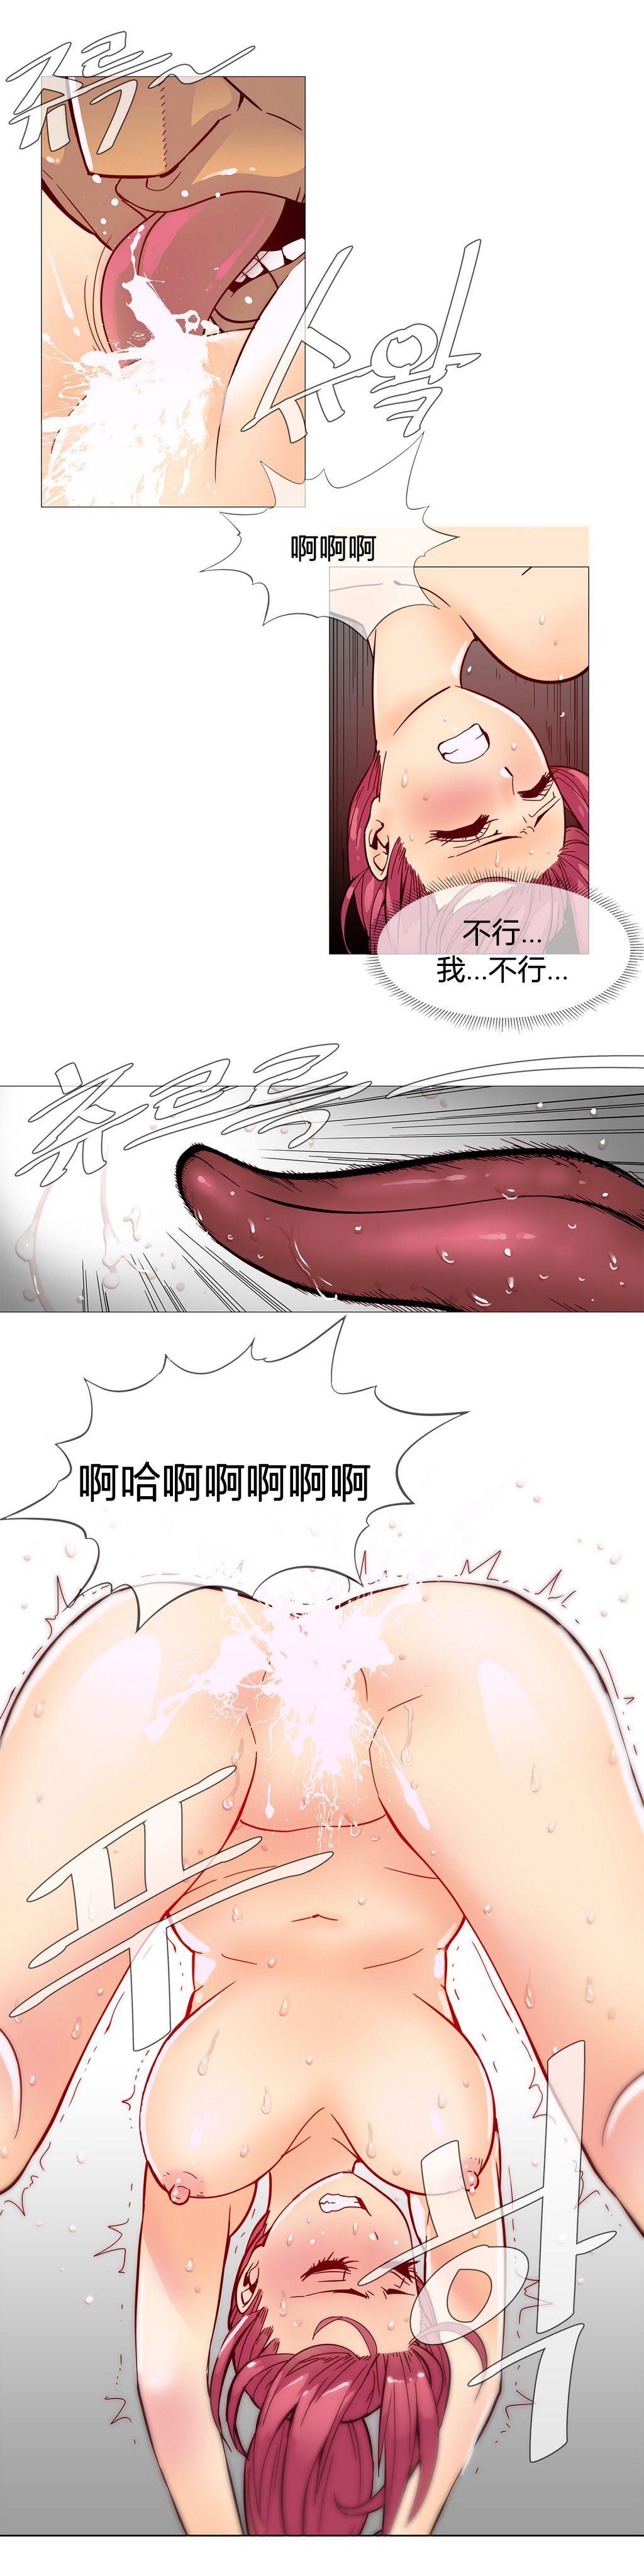 HouseHold Affairs 【卞赤鲤个人汉化】1~33话(持续更新中) 202